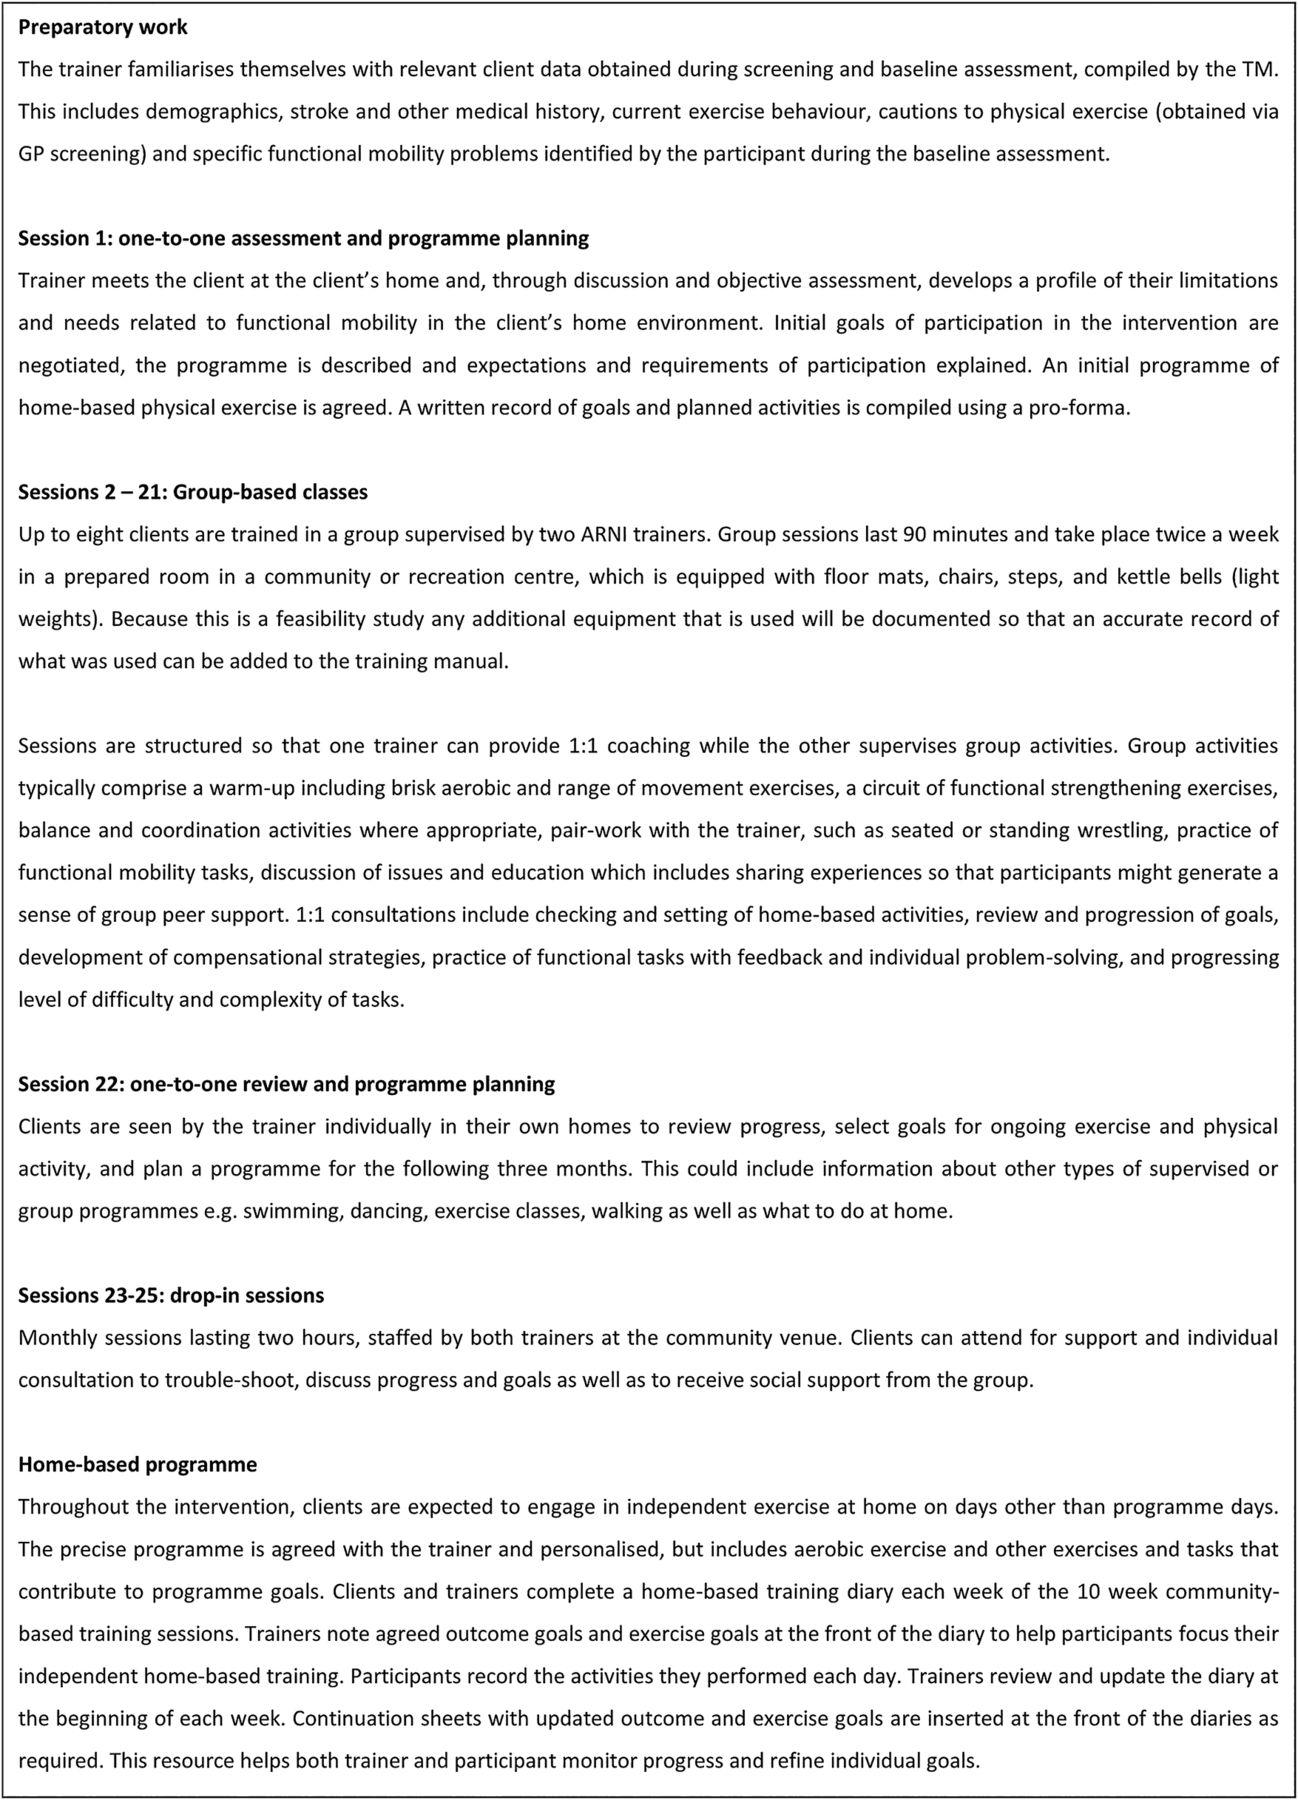 university essay topic life of pi